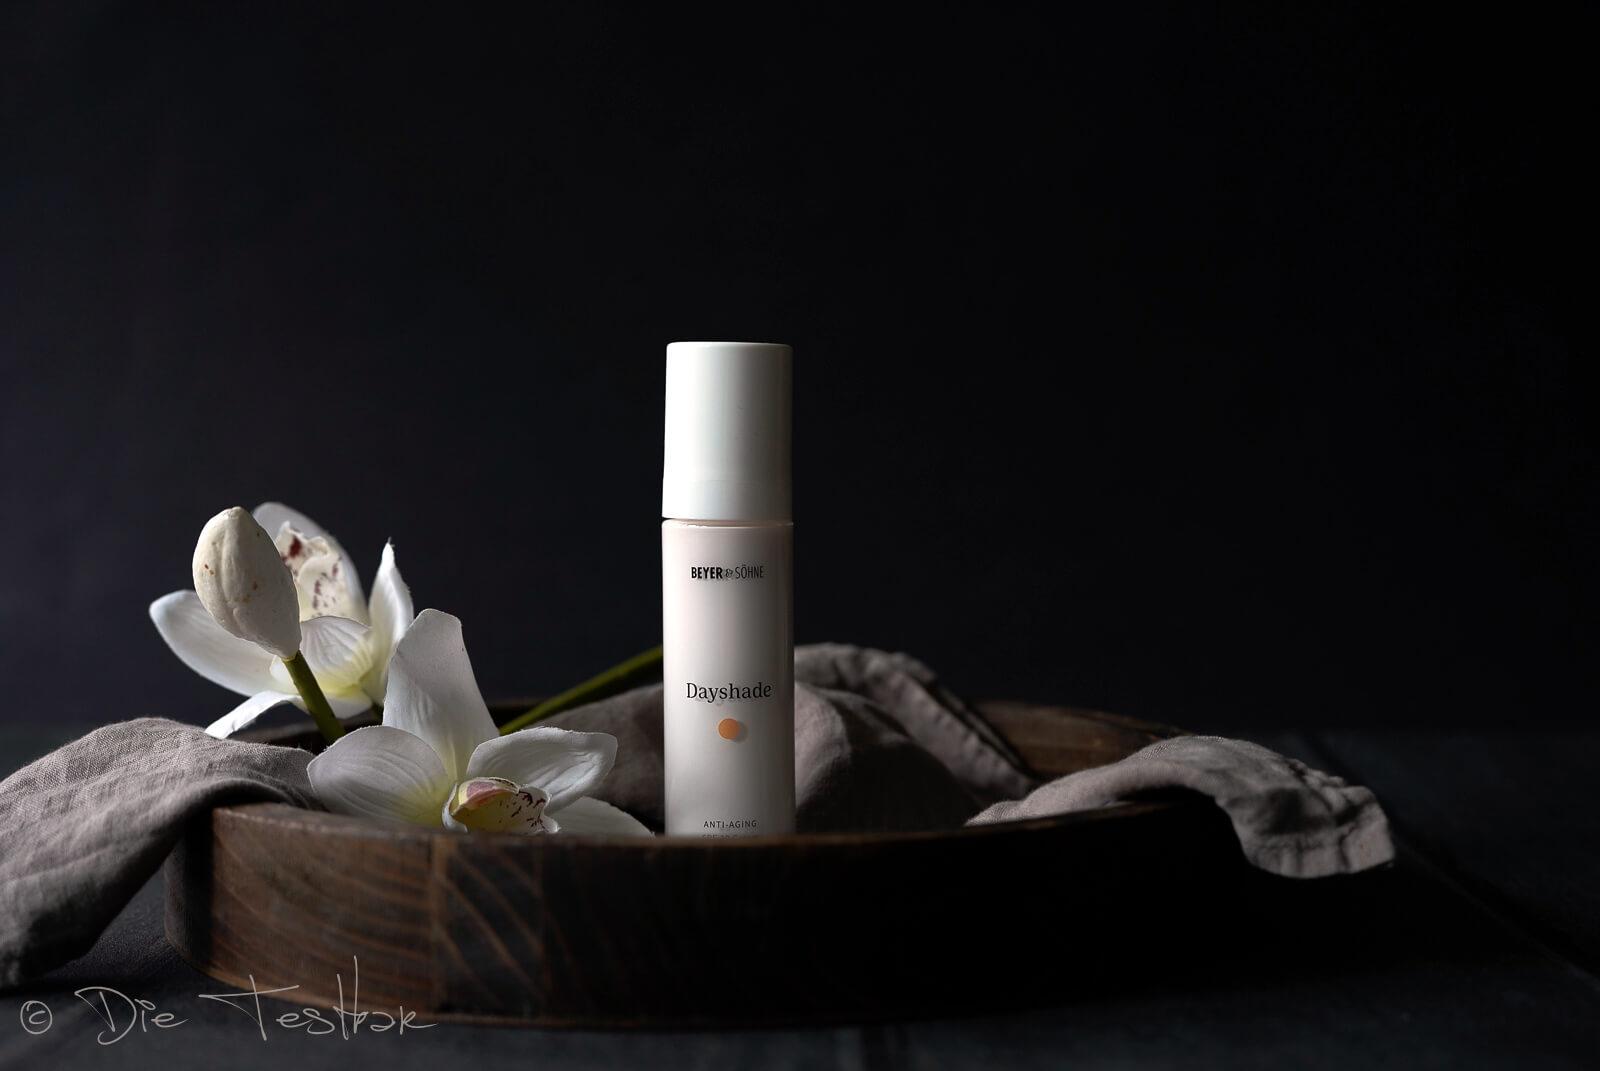 Dayshade Cream SPF 30